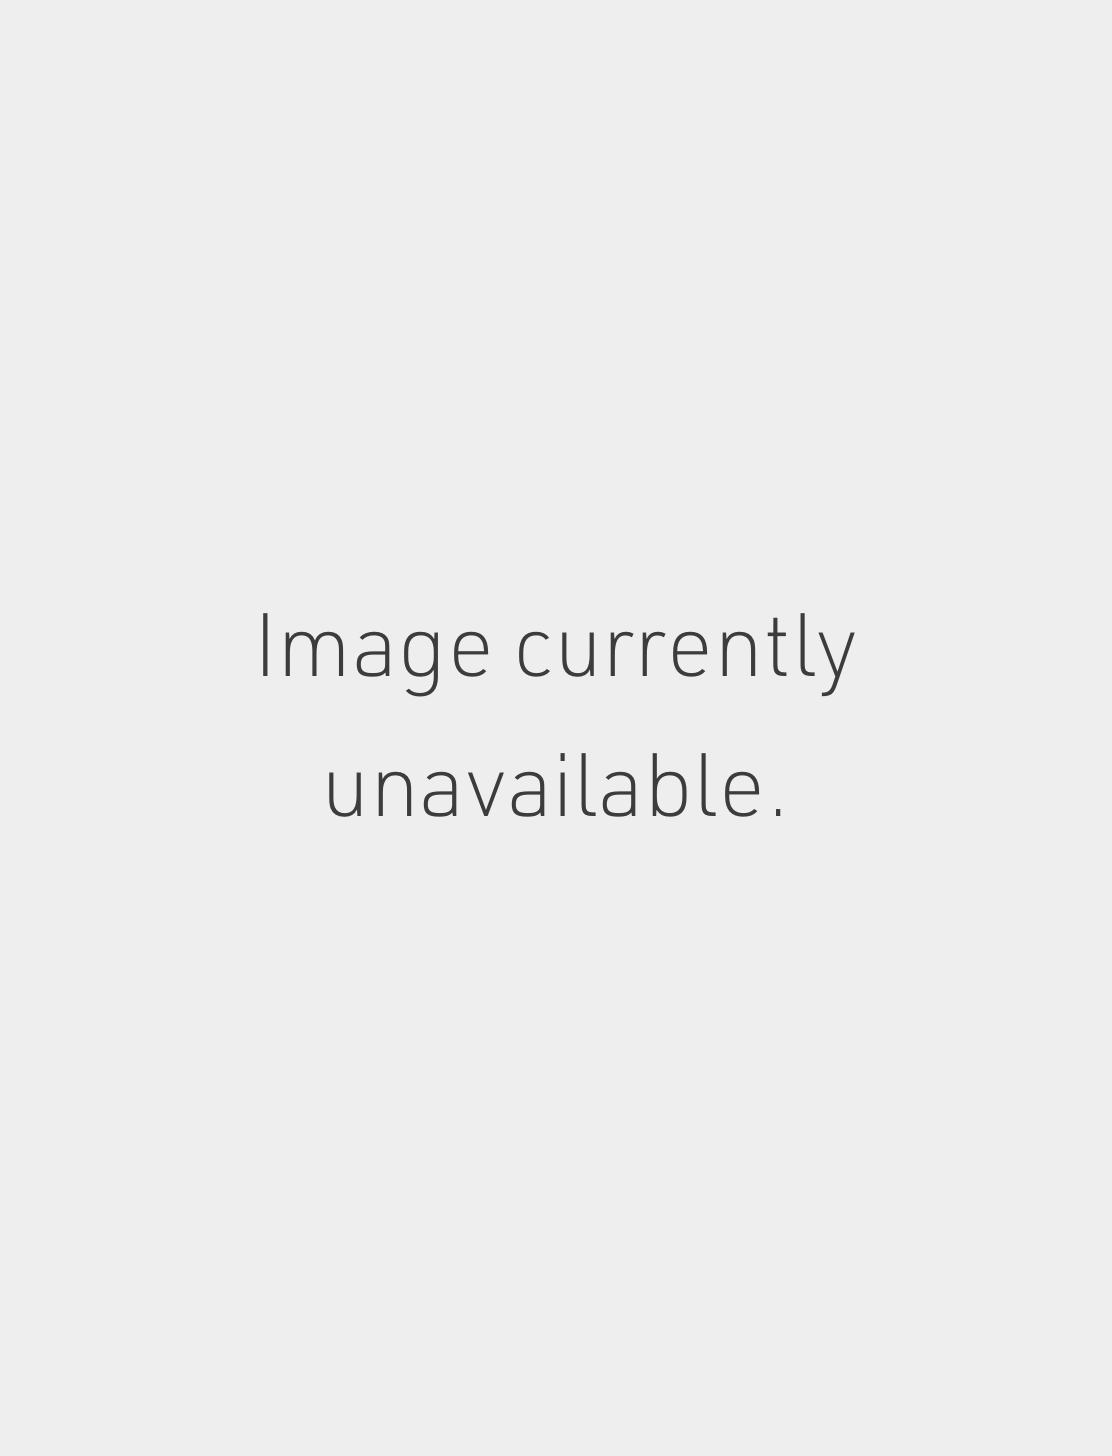 Med. Matte Skull with Black Diamond Eyes Tash Thread Image #1